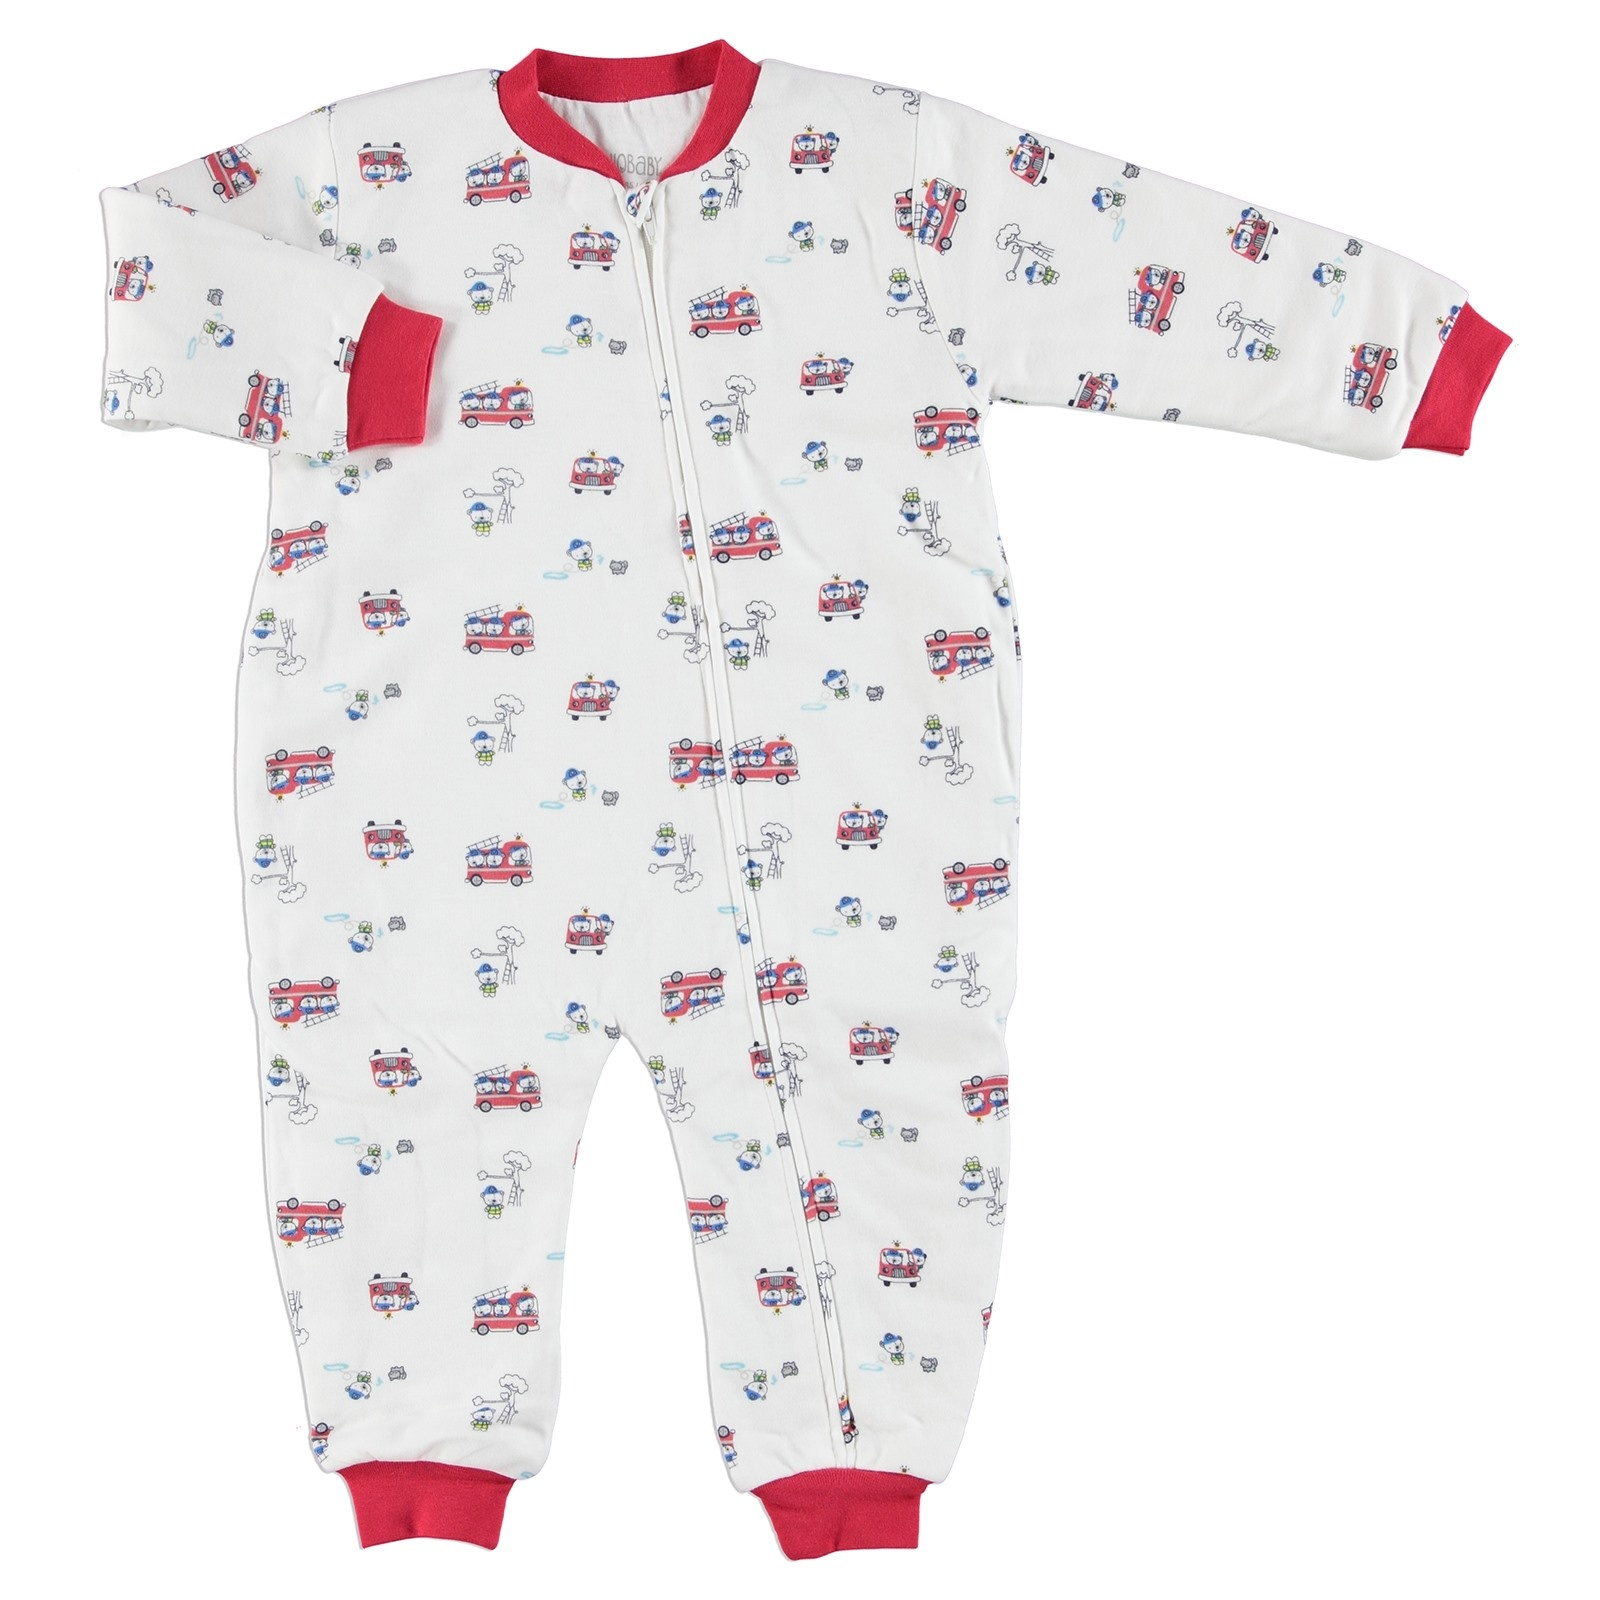 Ebebek HelloBaby Firefighters Baby Sleepsuit Romper